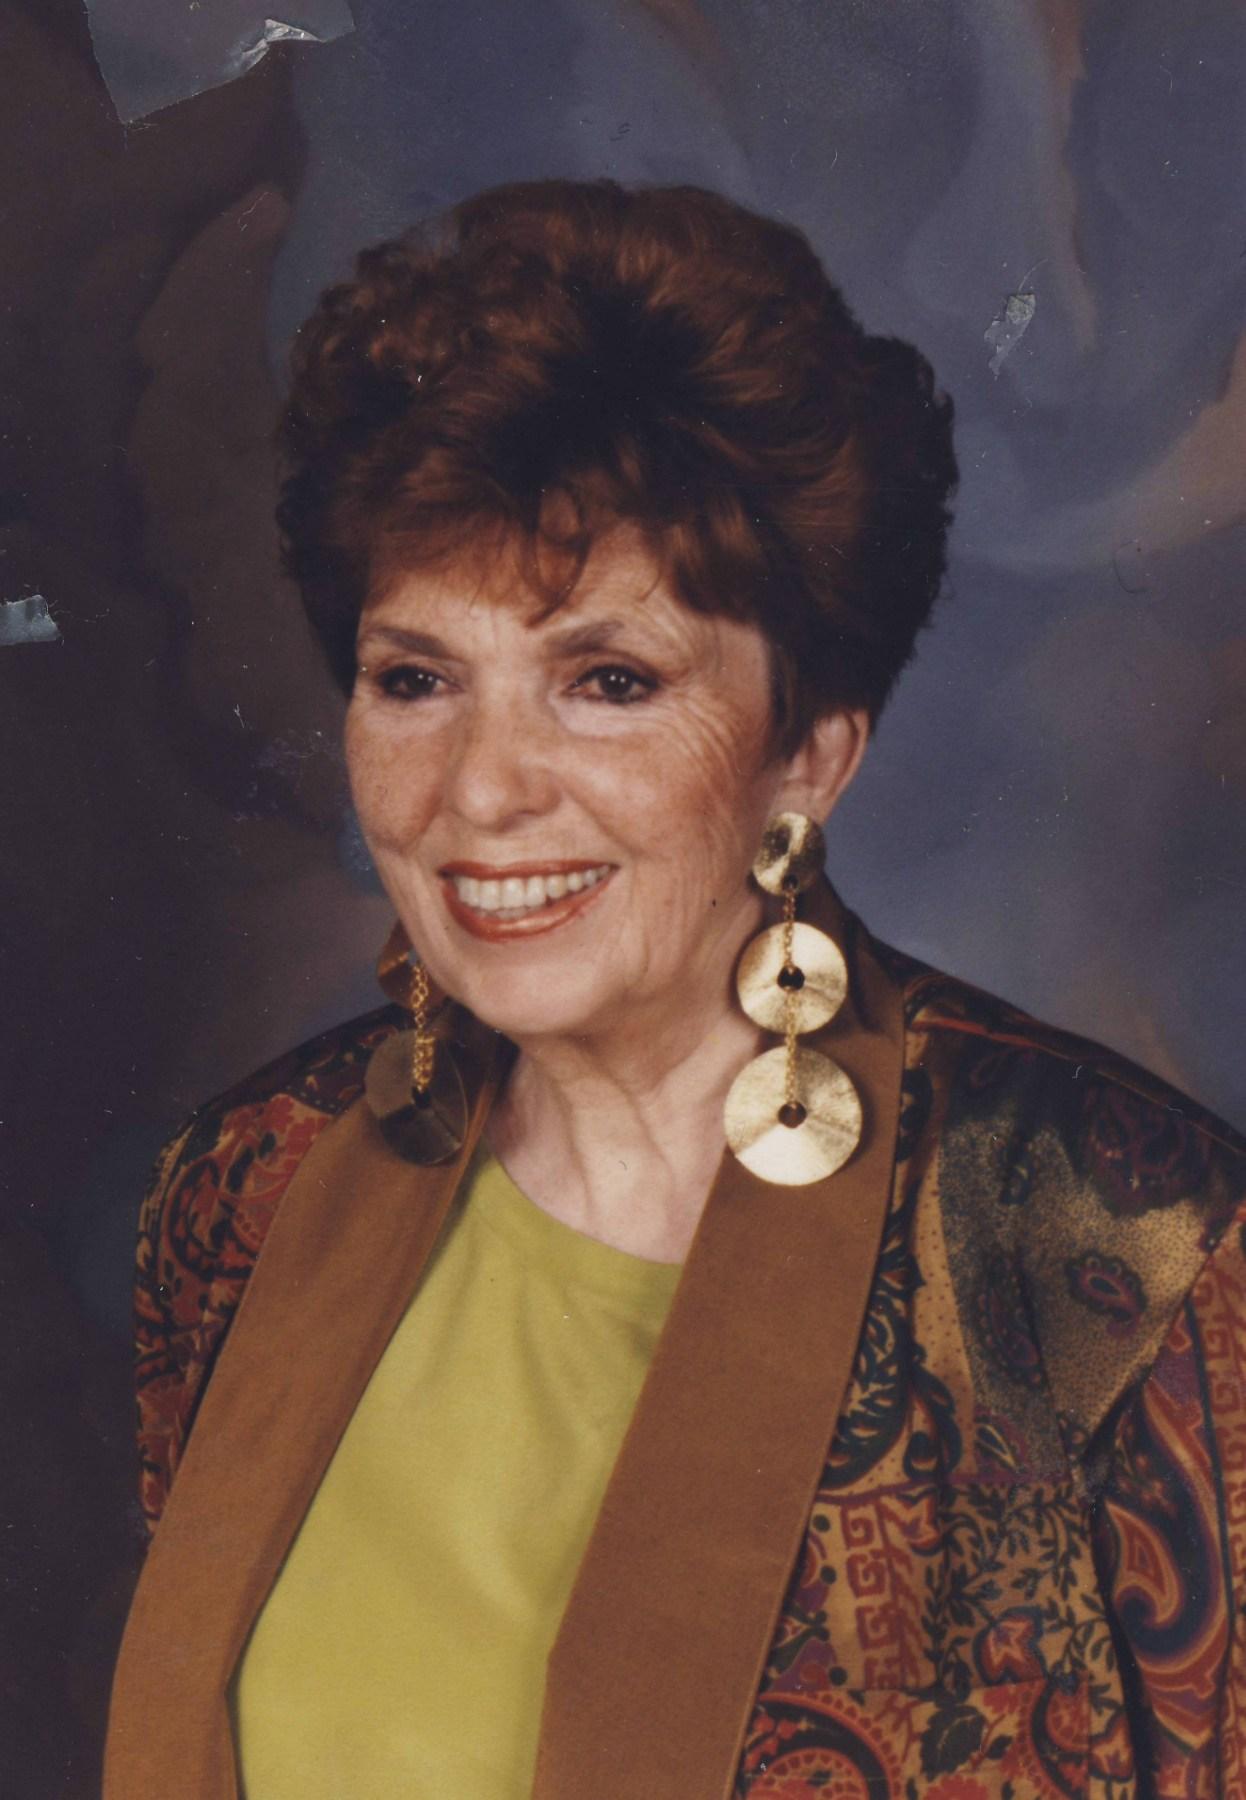 Tina Munim (now Tina Ambani),Carol Lynn Maillard Sex tube Roberta Gemma,Helen Reddy